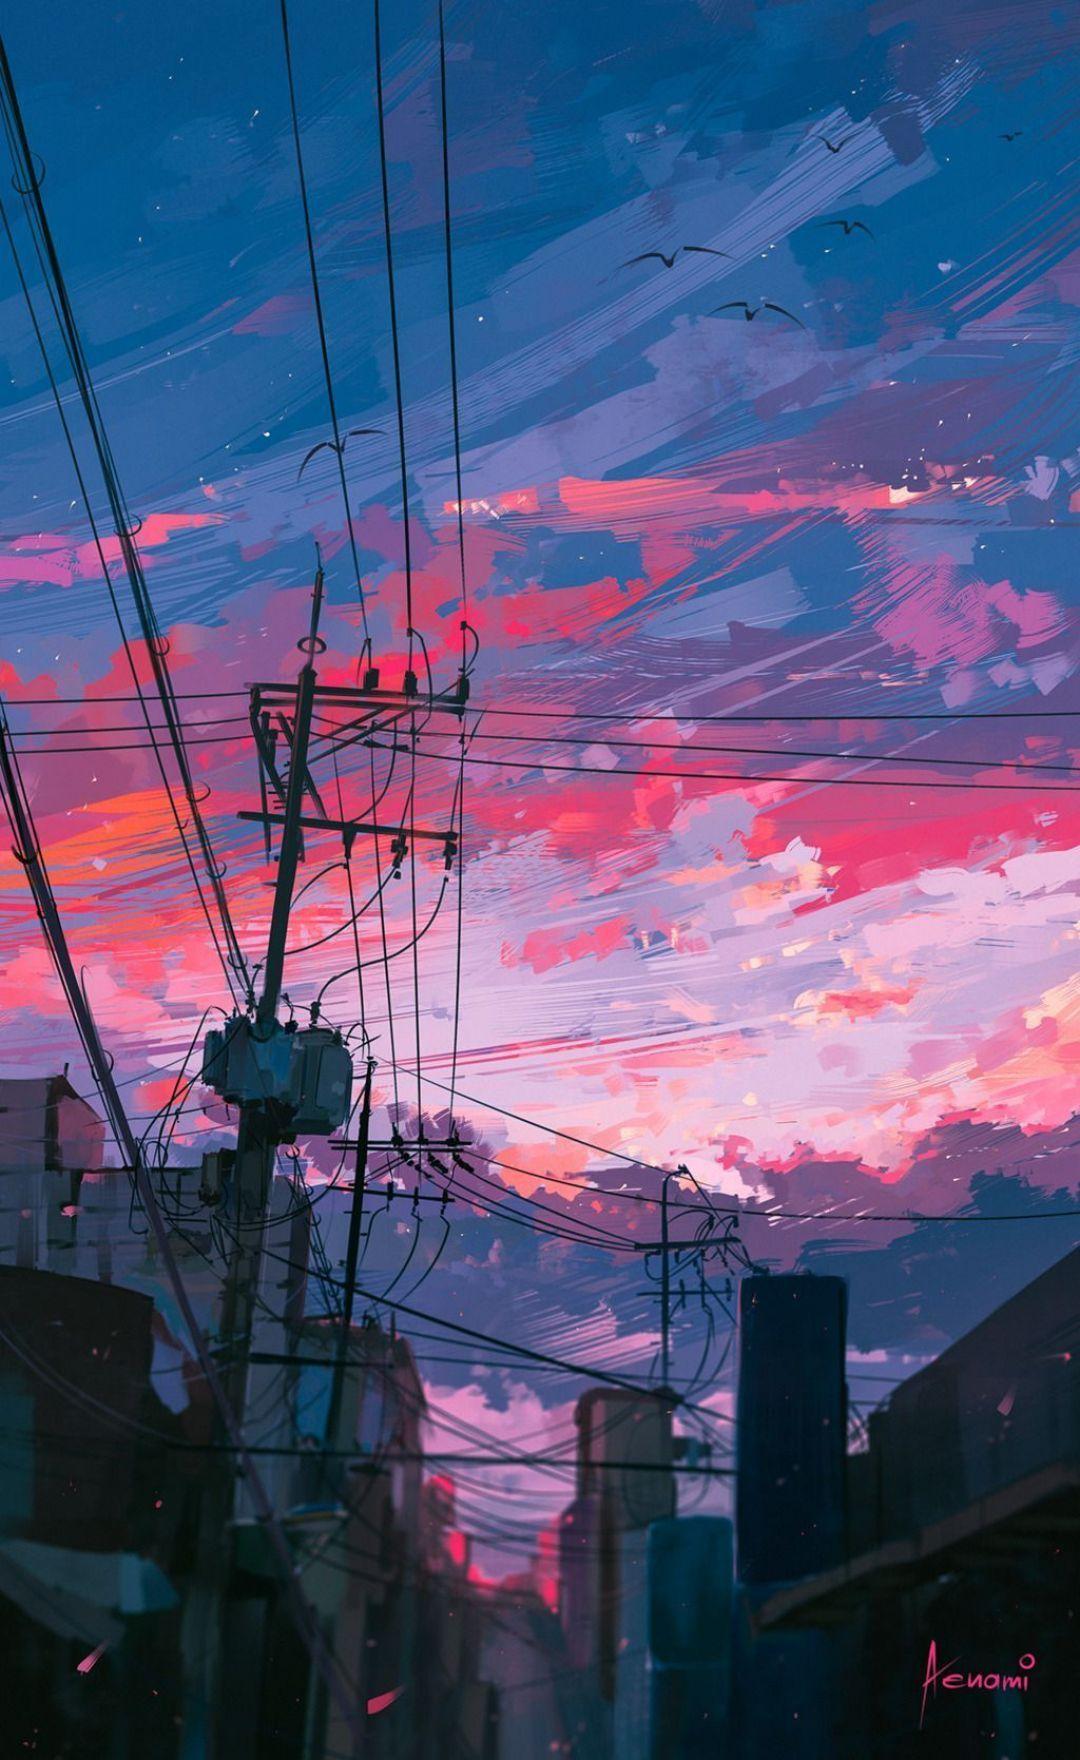 Iphone Wallpaper Anime 21k